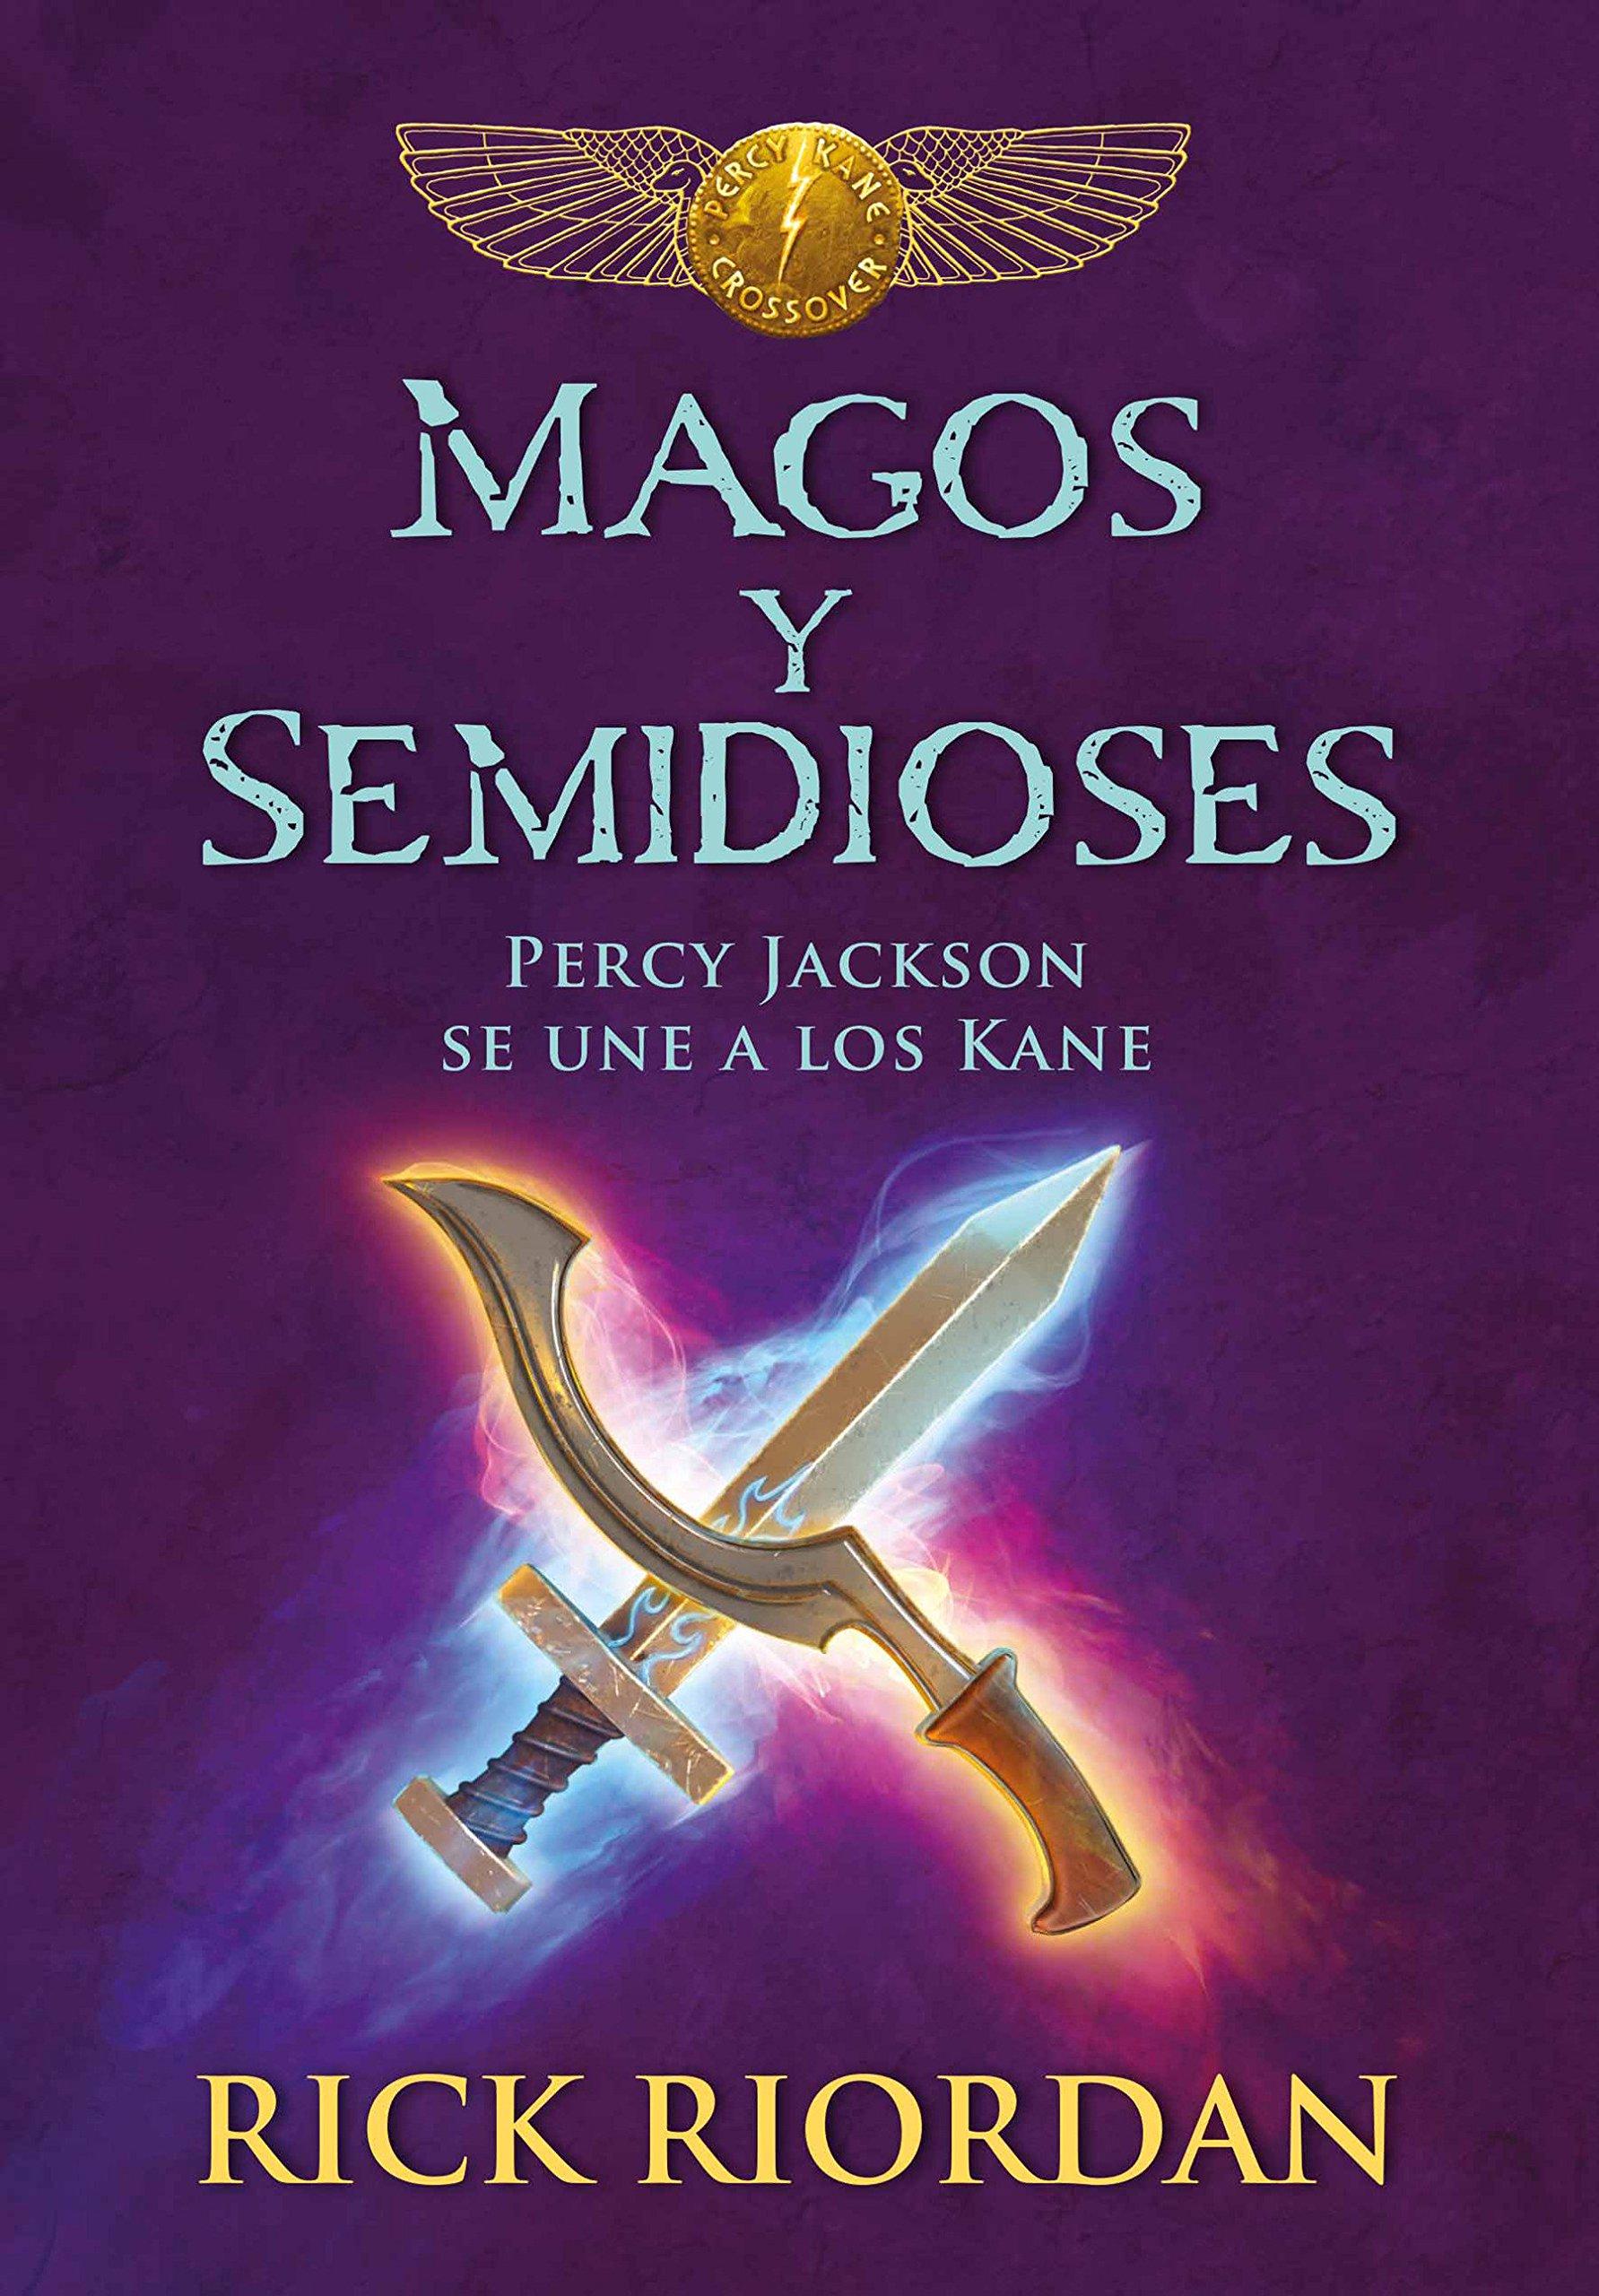 Download Magos y semidioses Percy Jackson se une a los Kane/ Demigods & Magicians: Percy and Annabeth Meet the Kanes (Spanish Edition) pdf